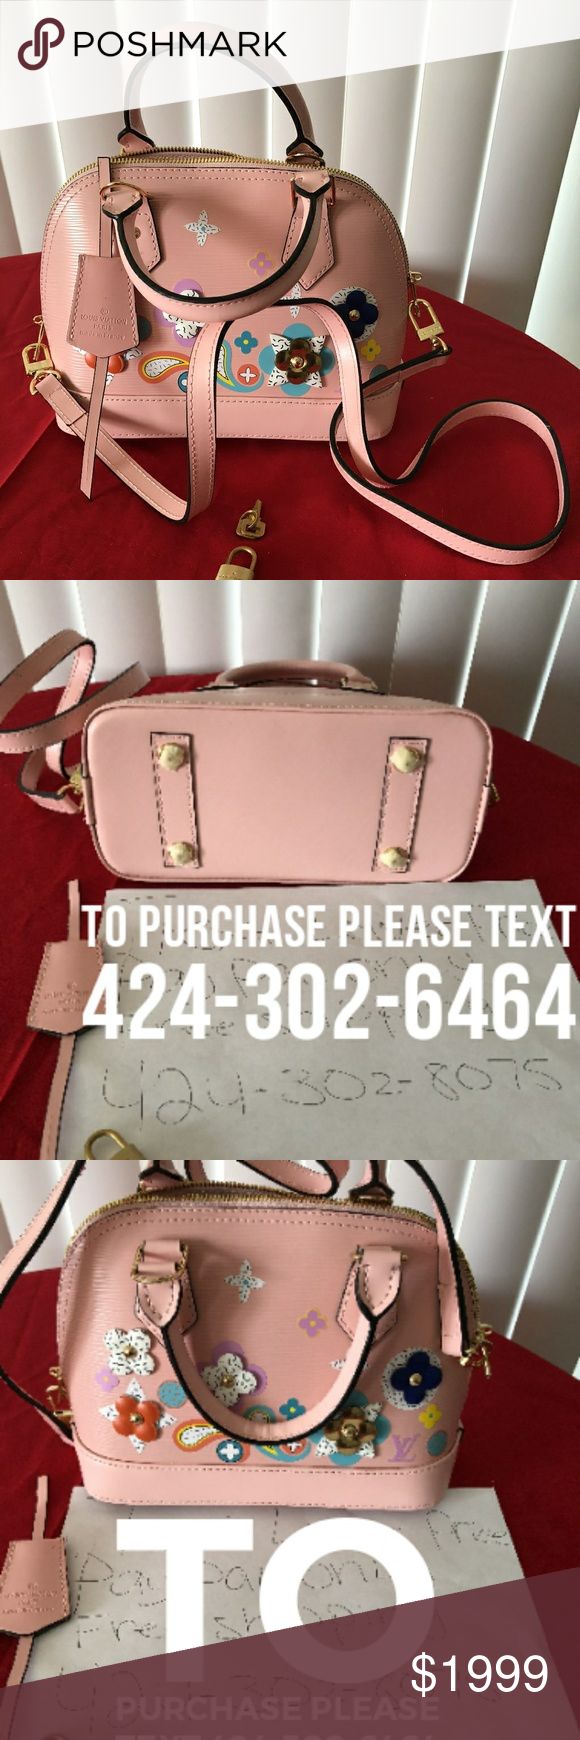 0cc2ed487a63 Spotted while shopping on Poshmark  Louis Vuitton Handbag!  poshmark   fashion  shopping  style  Louis Vuitton  Handbags